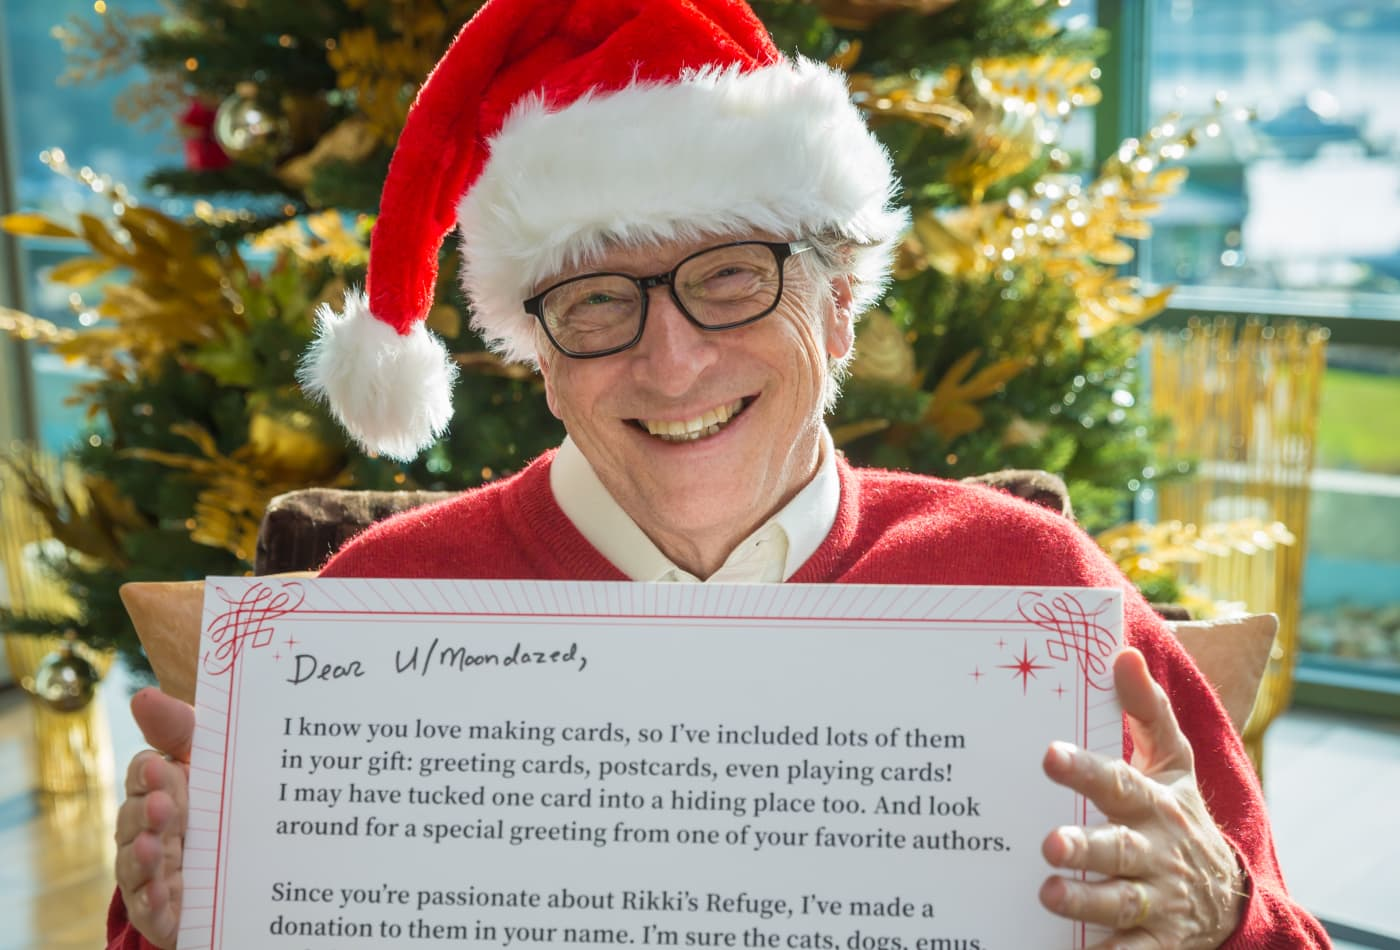 What Bill Gates gave his Reddit Secret Santa match in 2018